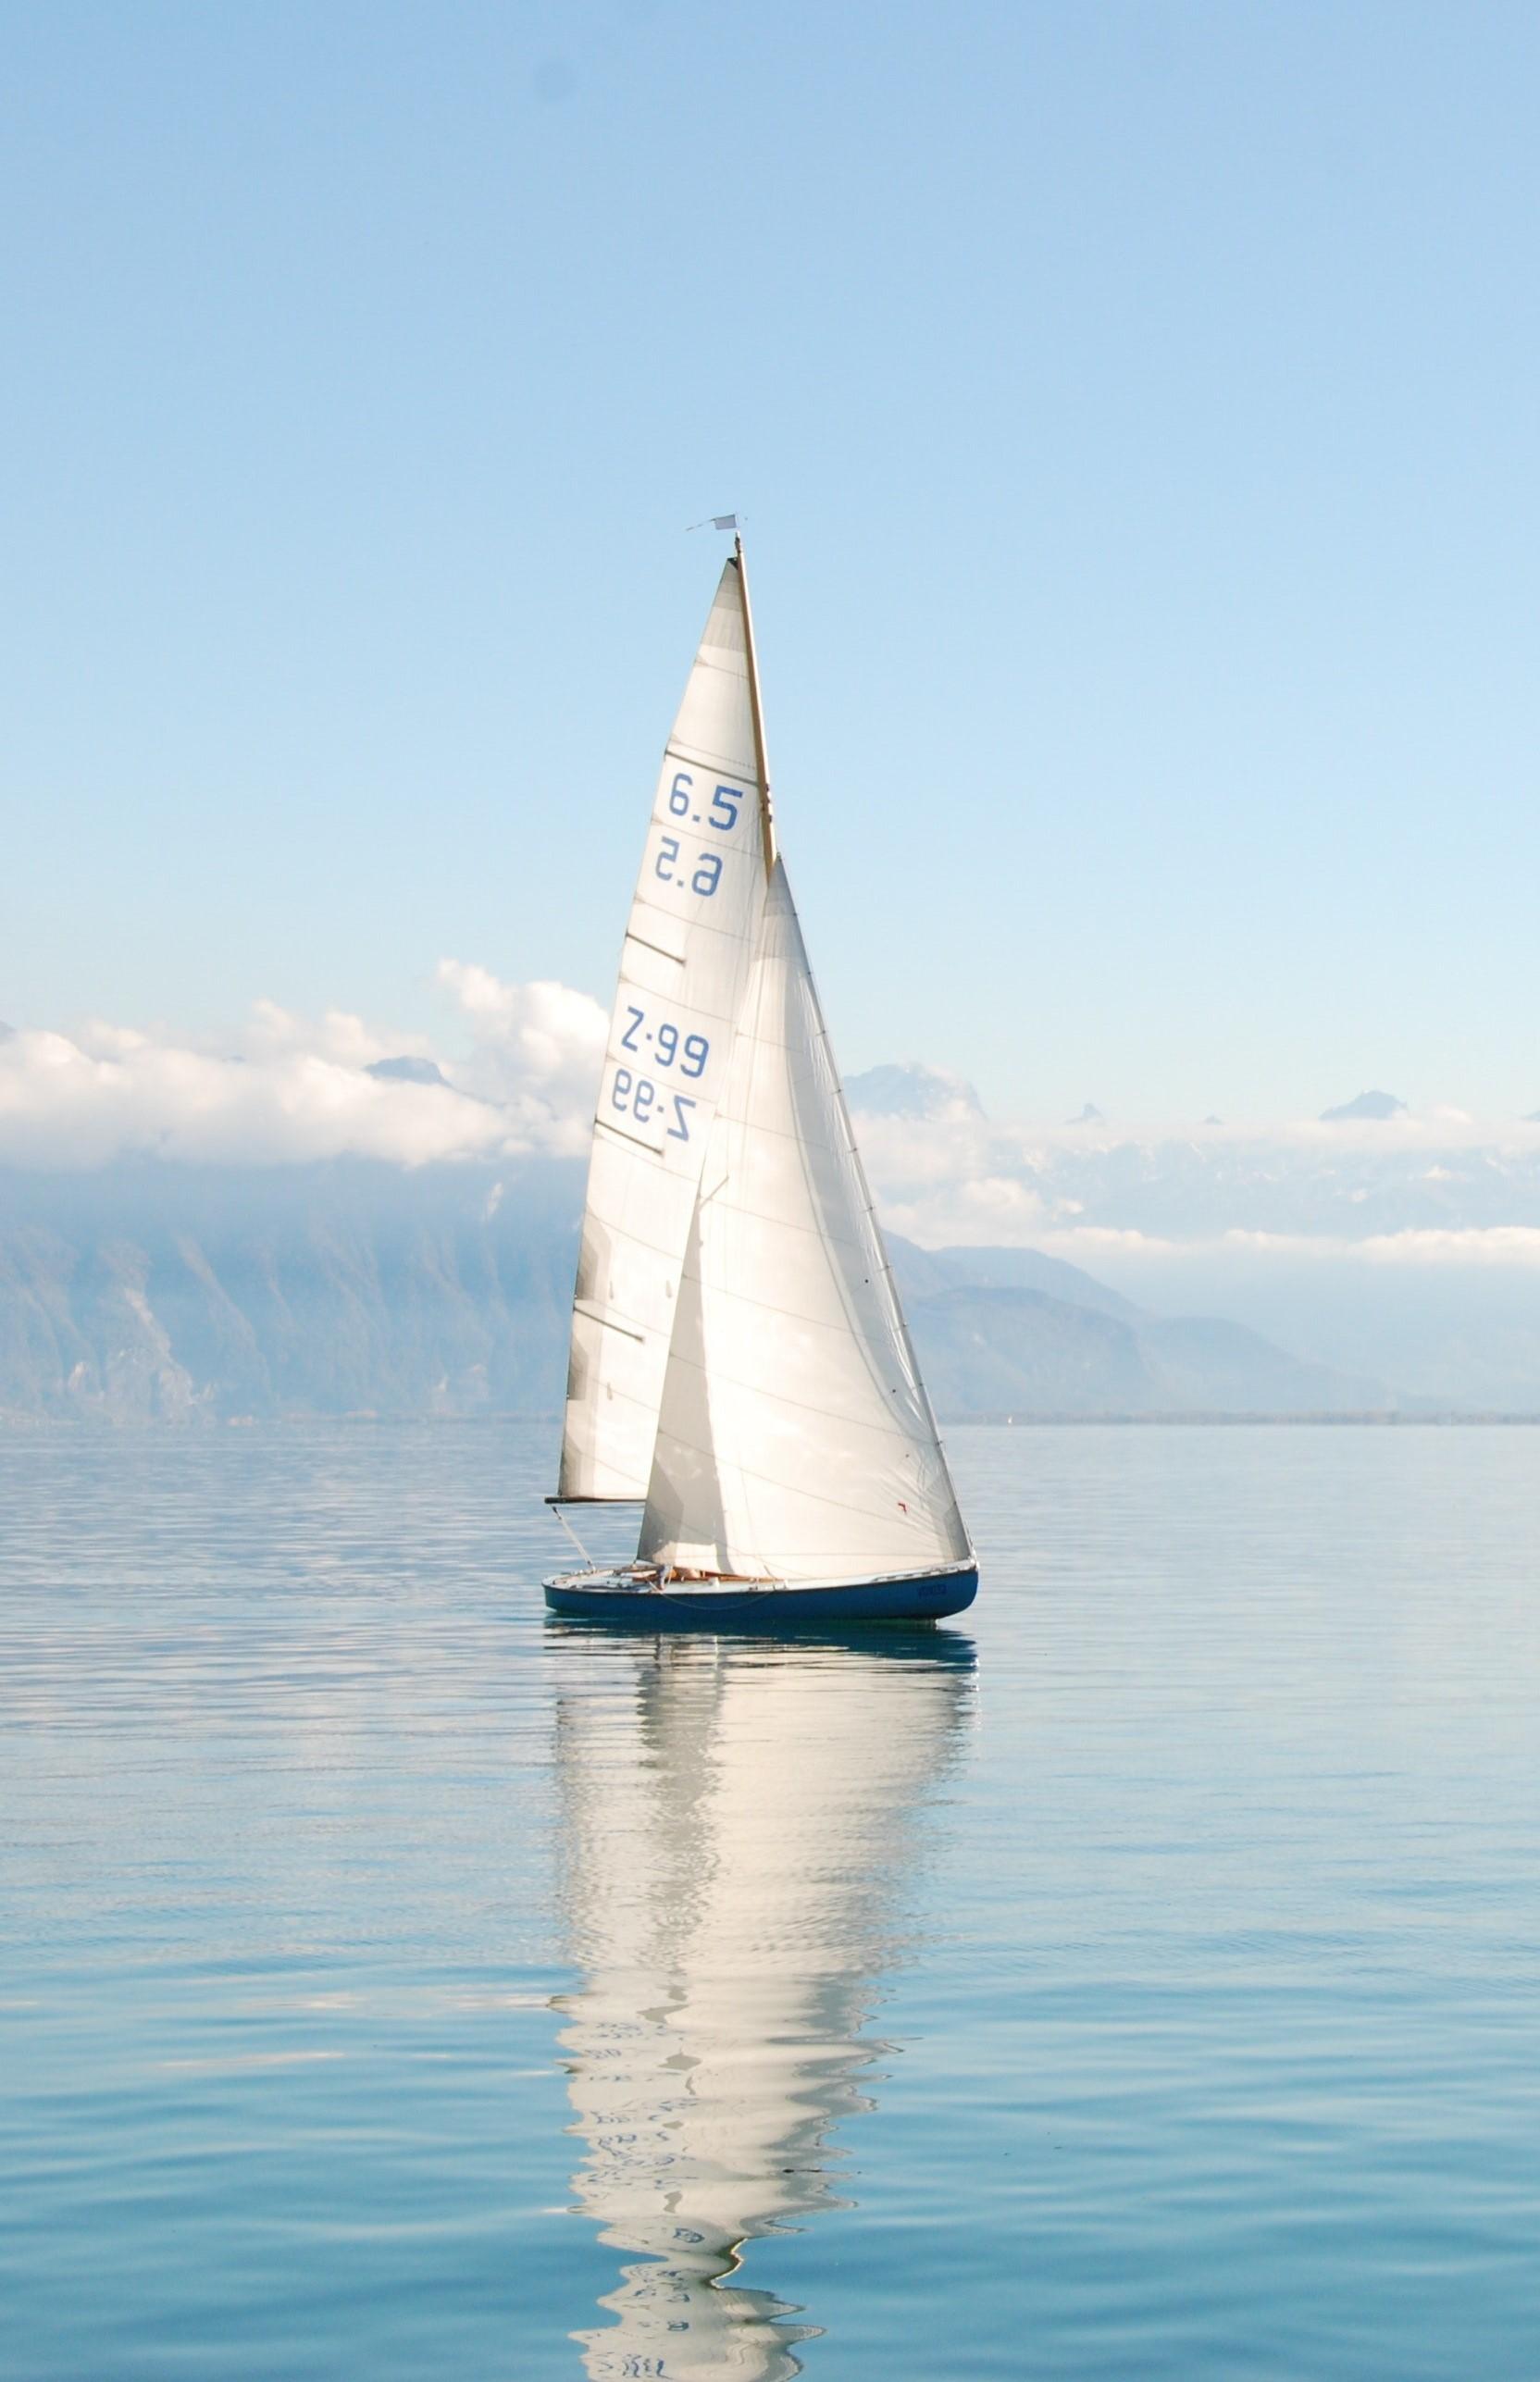 dinghy holiday 1 - Copy